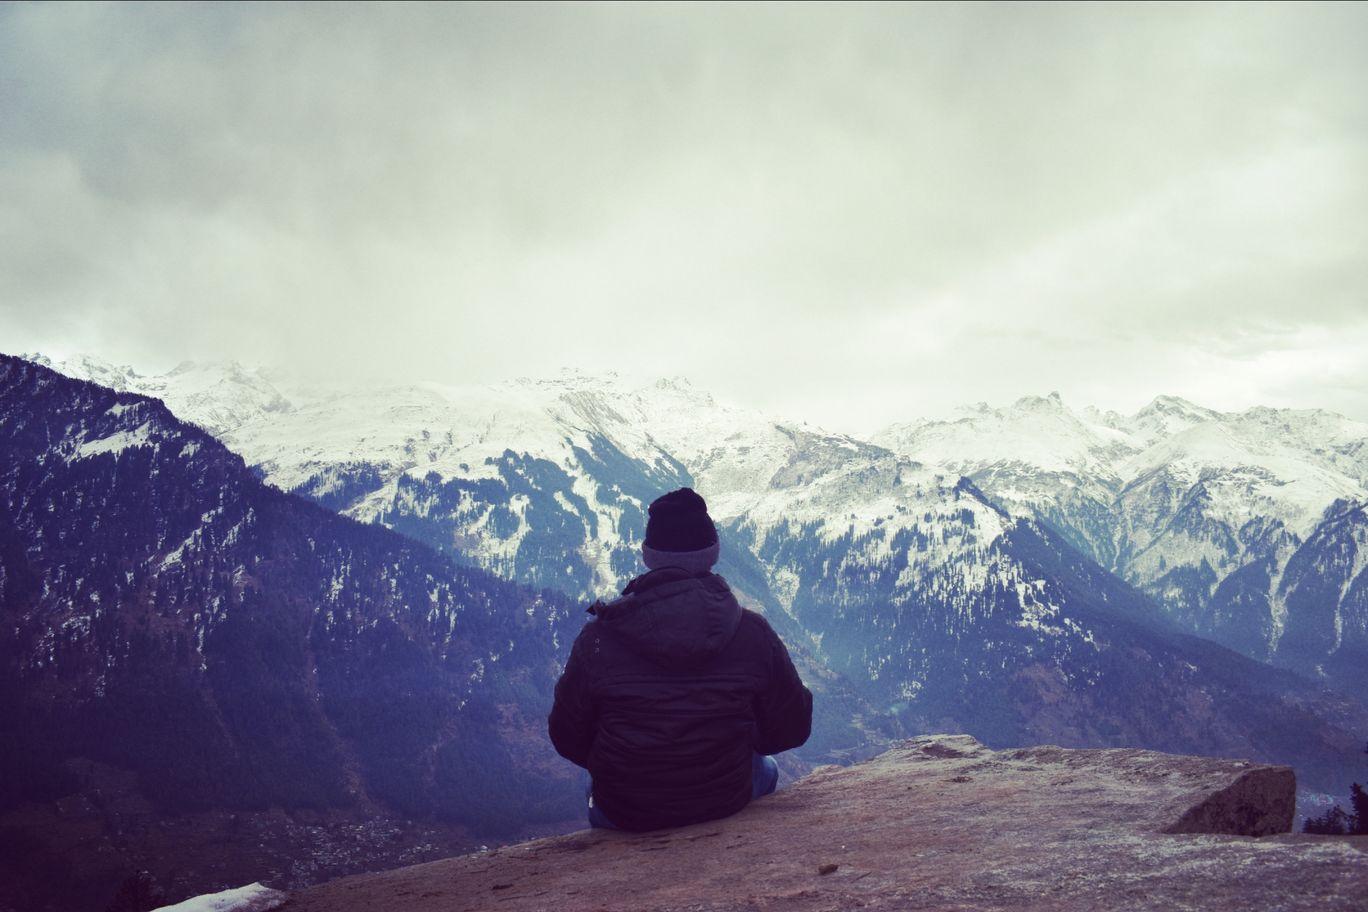 Photo of Lama Dugh Trek Start Point By Divyanshu Bhatia